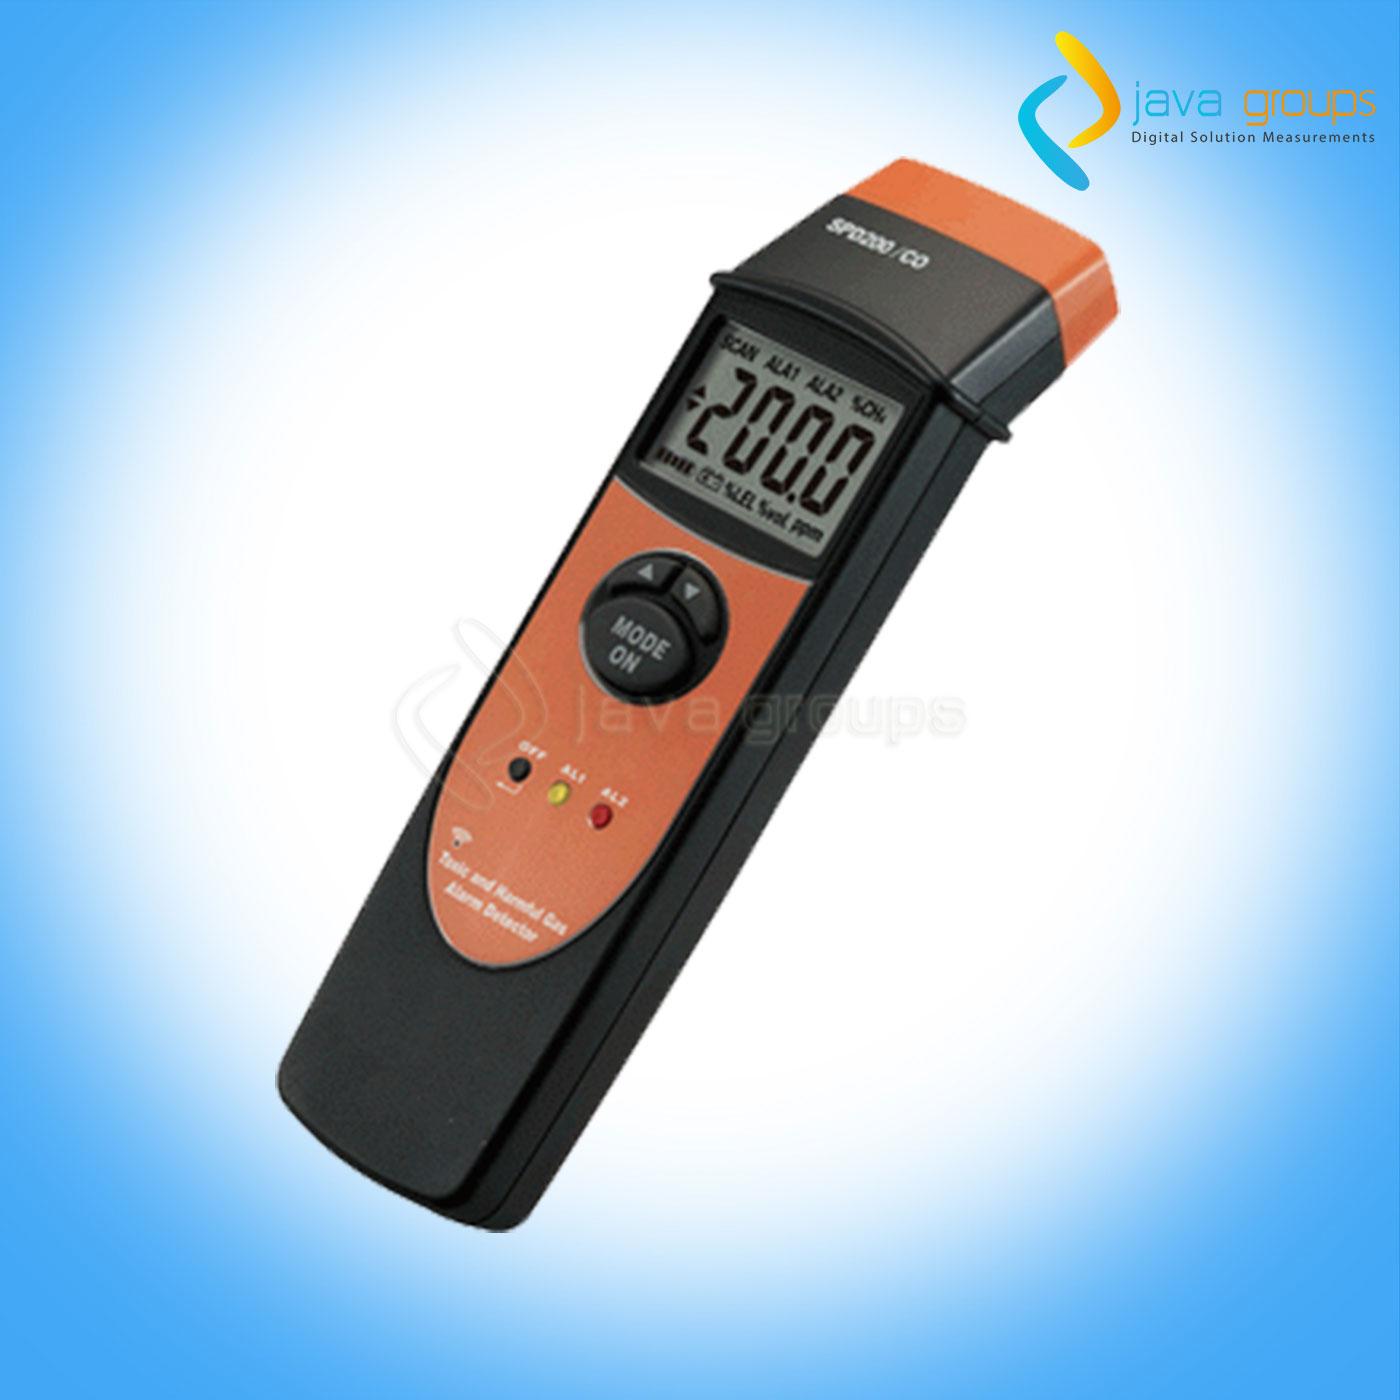 Alat Ukur pendeteksi Gas Karbon monoksida SPD-200